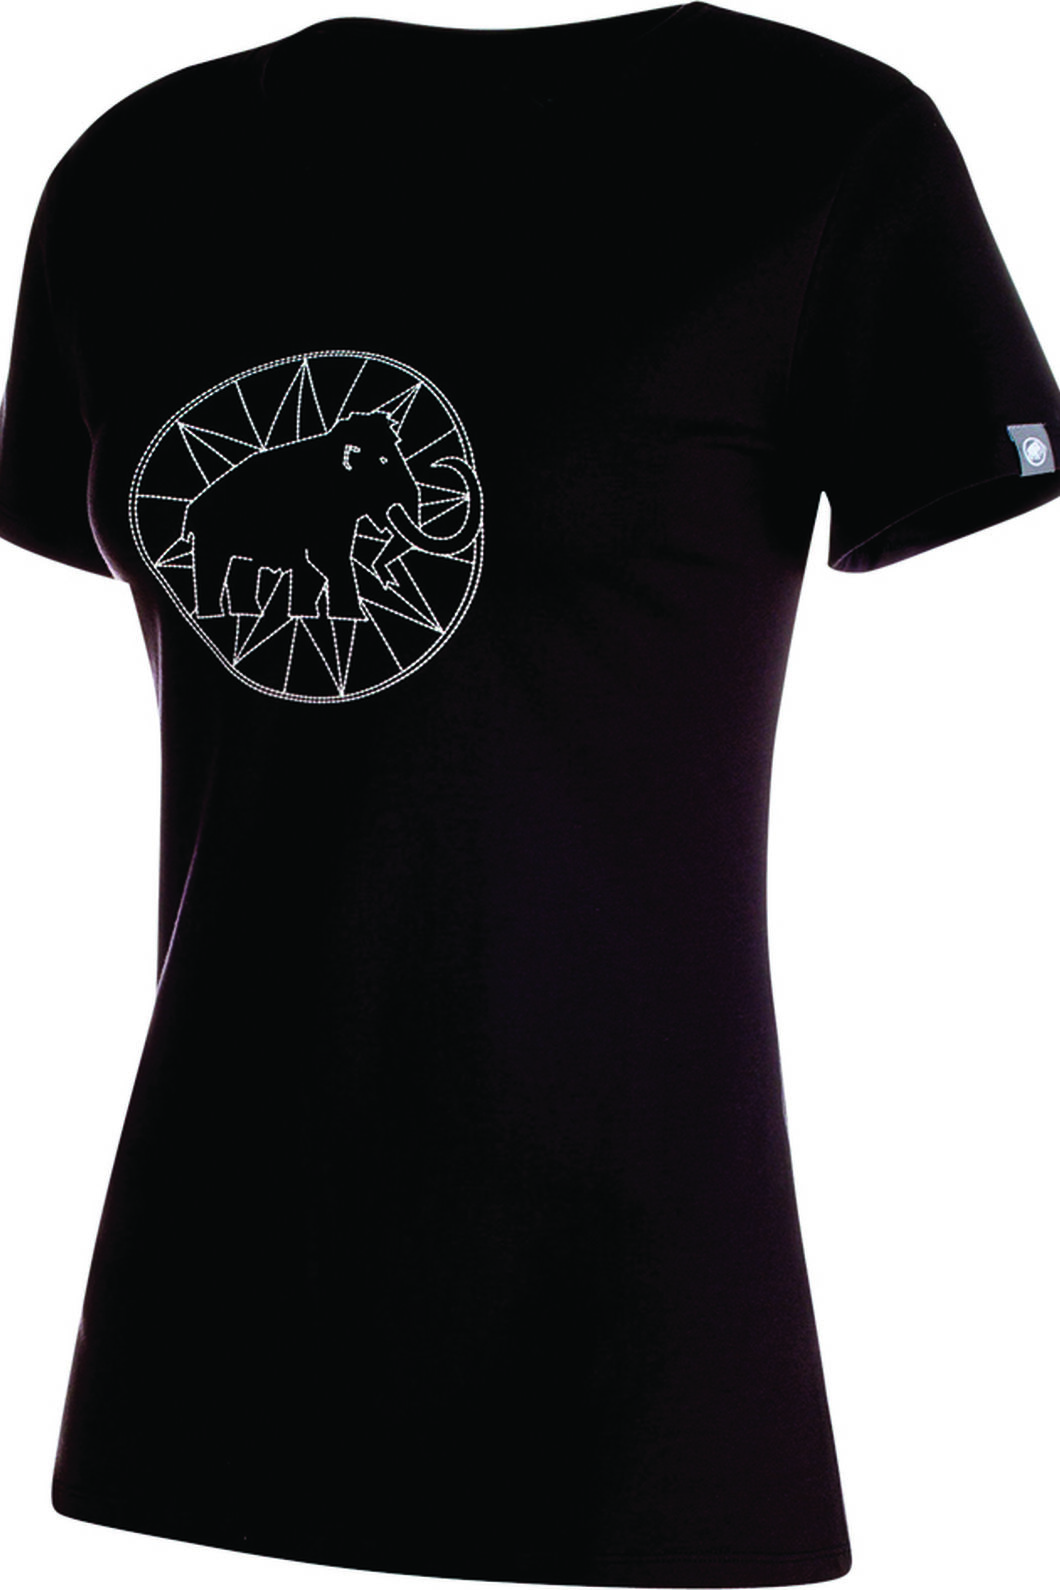 Mammut Logo T-Shirt - Women's, Black, hi-res